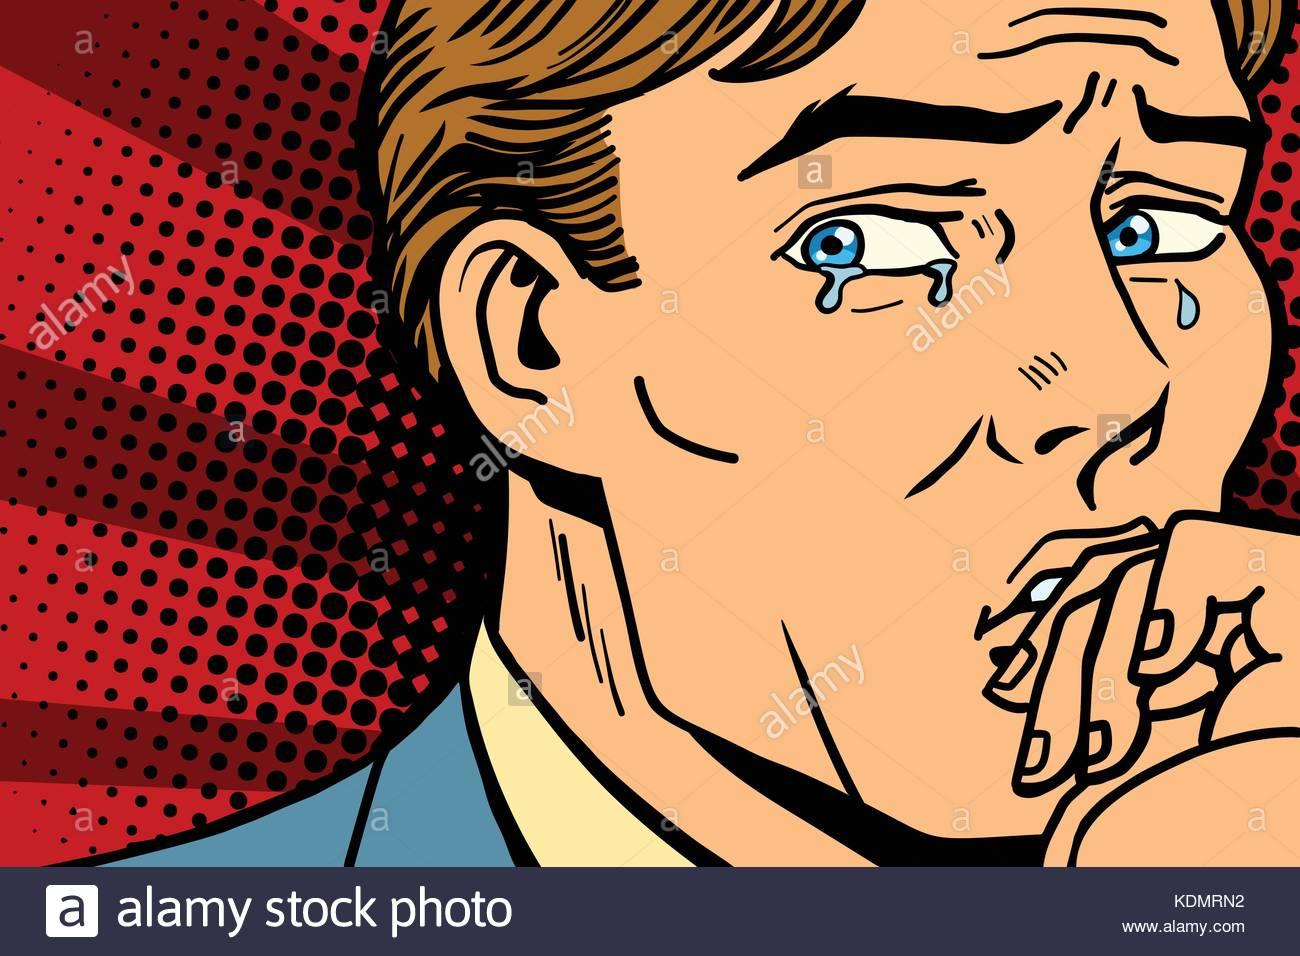 1300x956 Pop Art Man Crying In Depression. Comic Book Cartoon Retro Stock